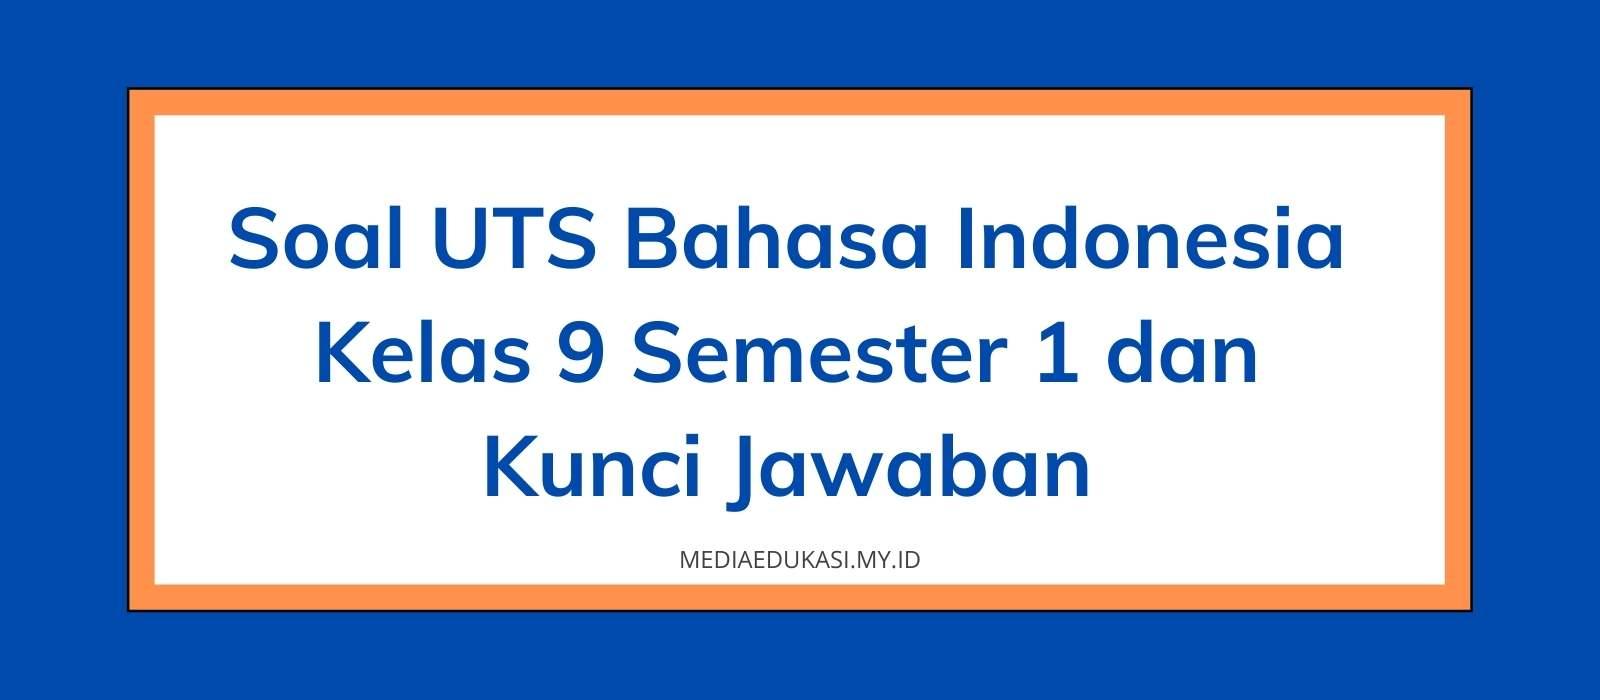 Soal PTS Bahasa Indonesia Kelas 9 Semester 1 dan Kunci Jawaban